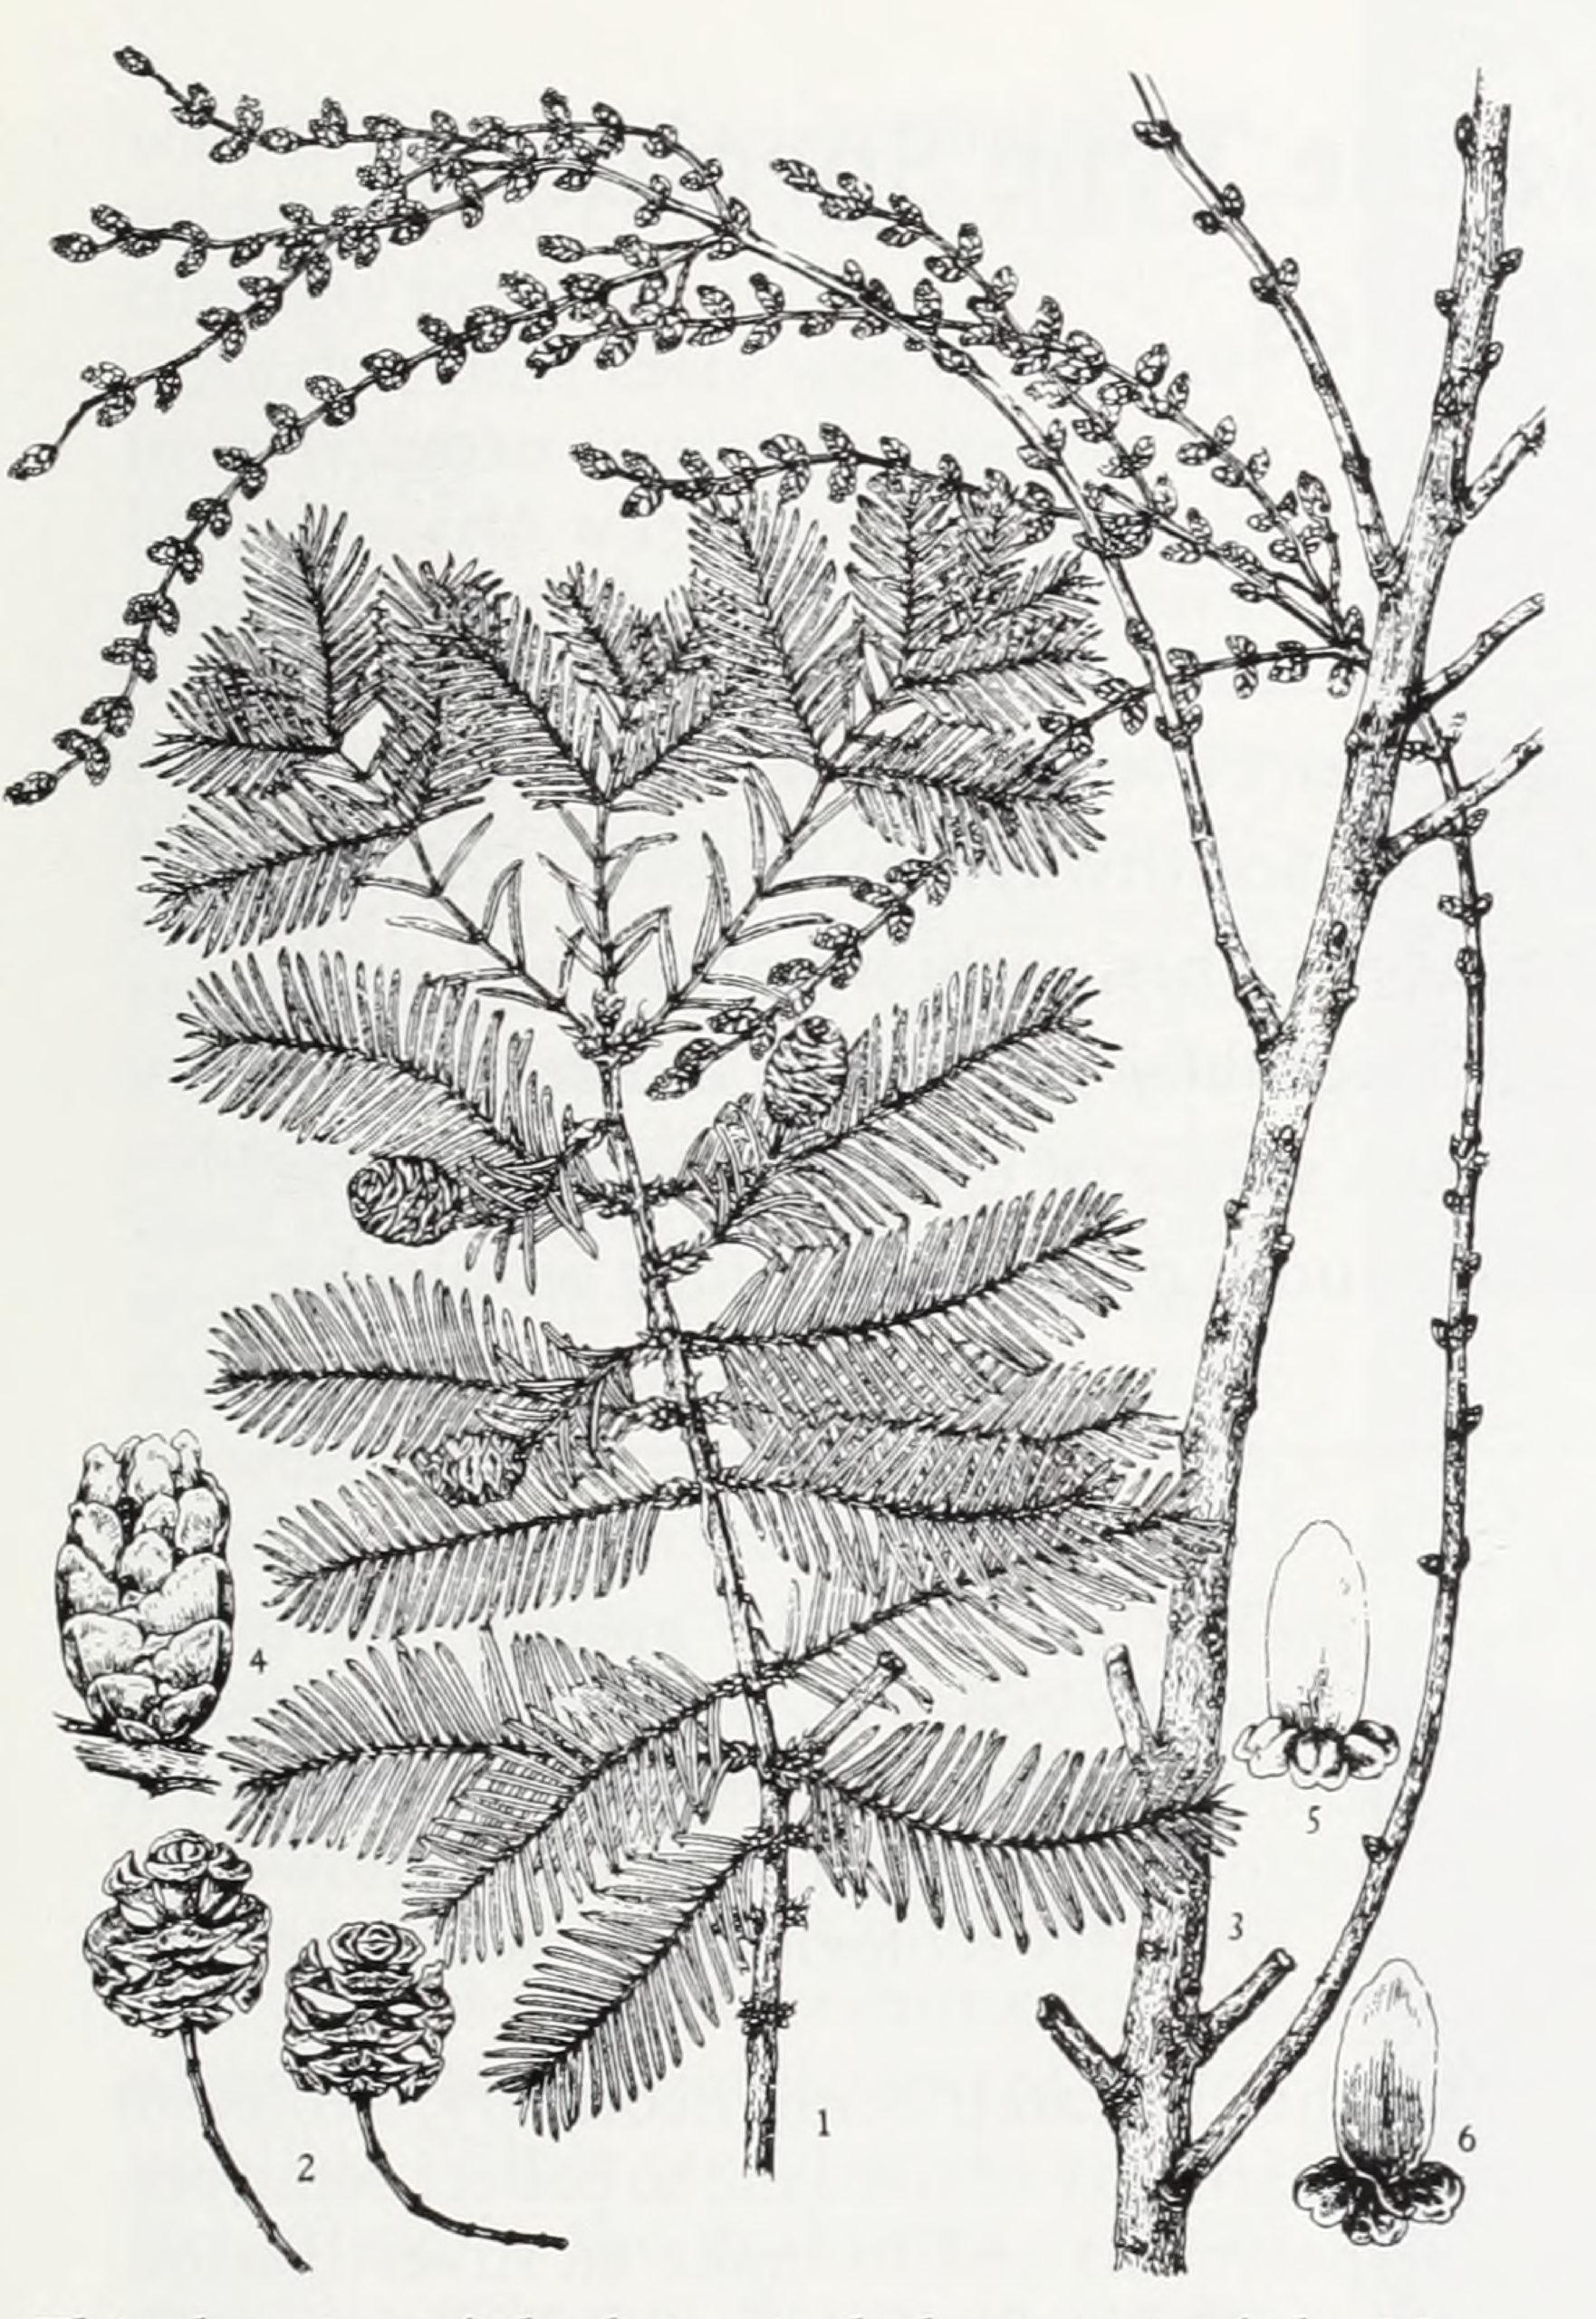 Botanical illustration of dawn redwood